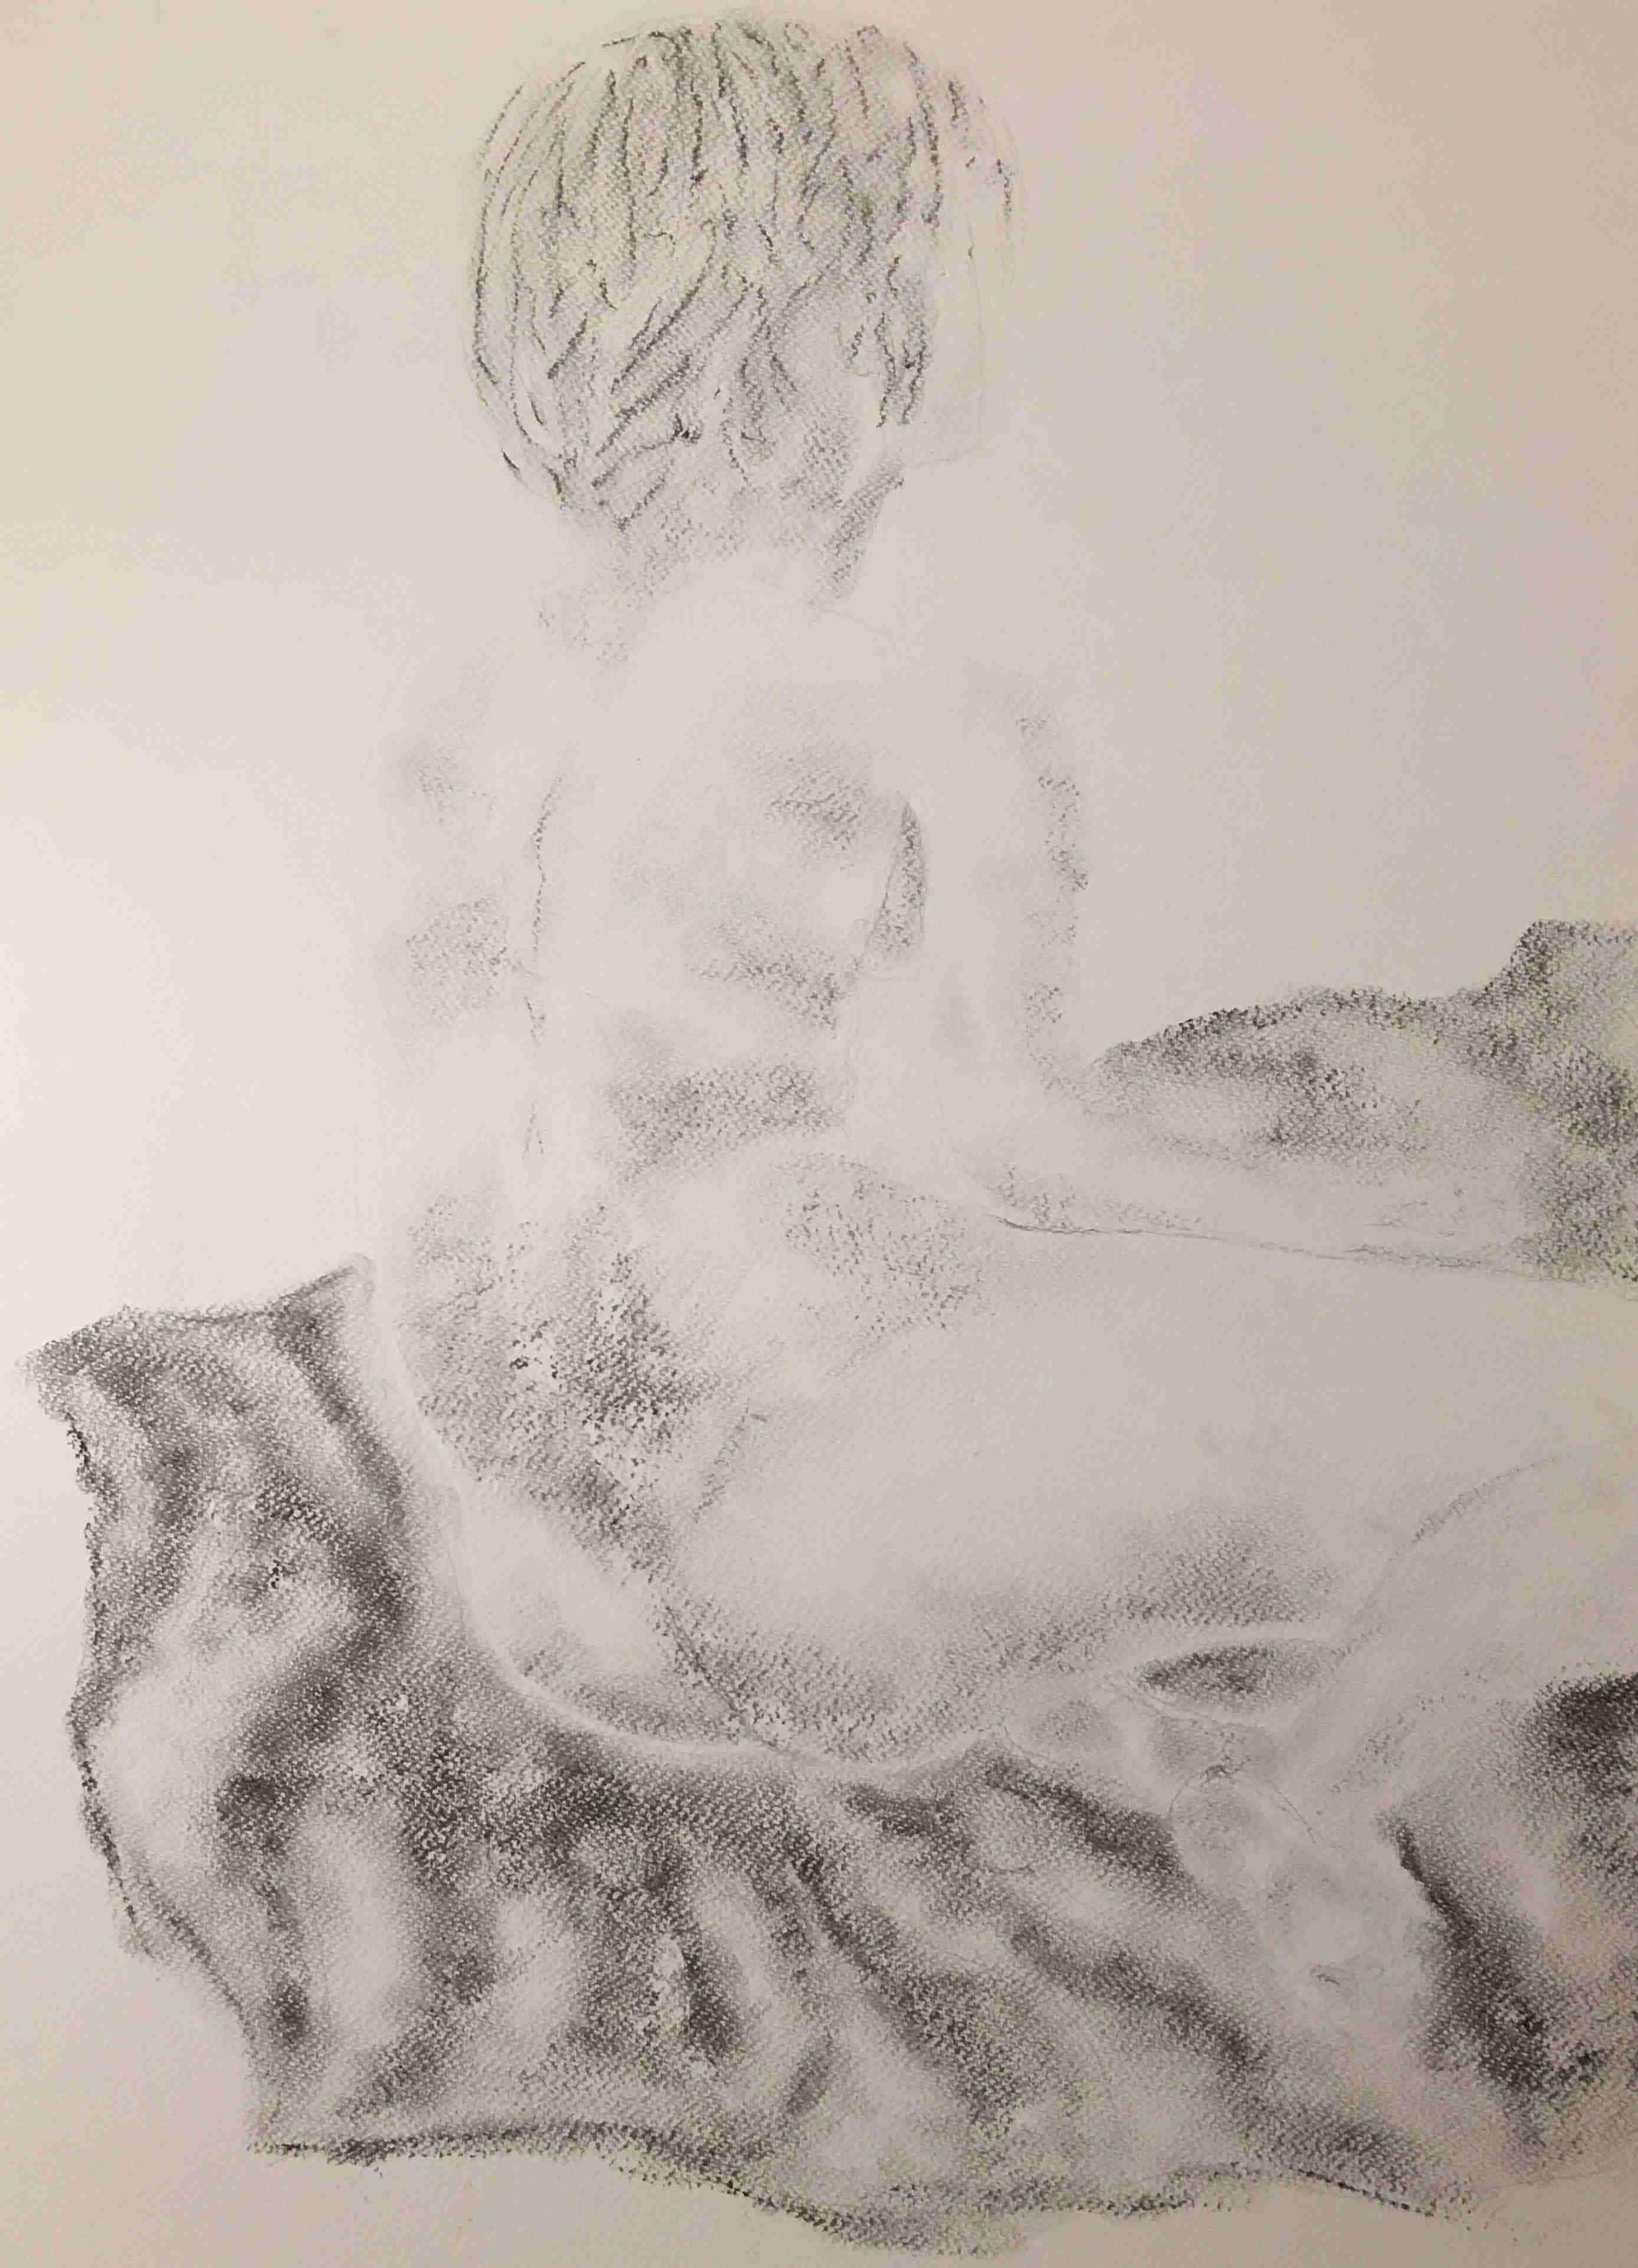 artiste peintre moderne contemporain nus fusain Monor 2018